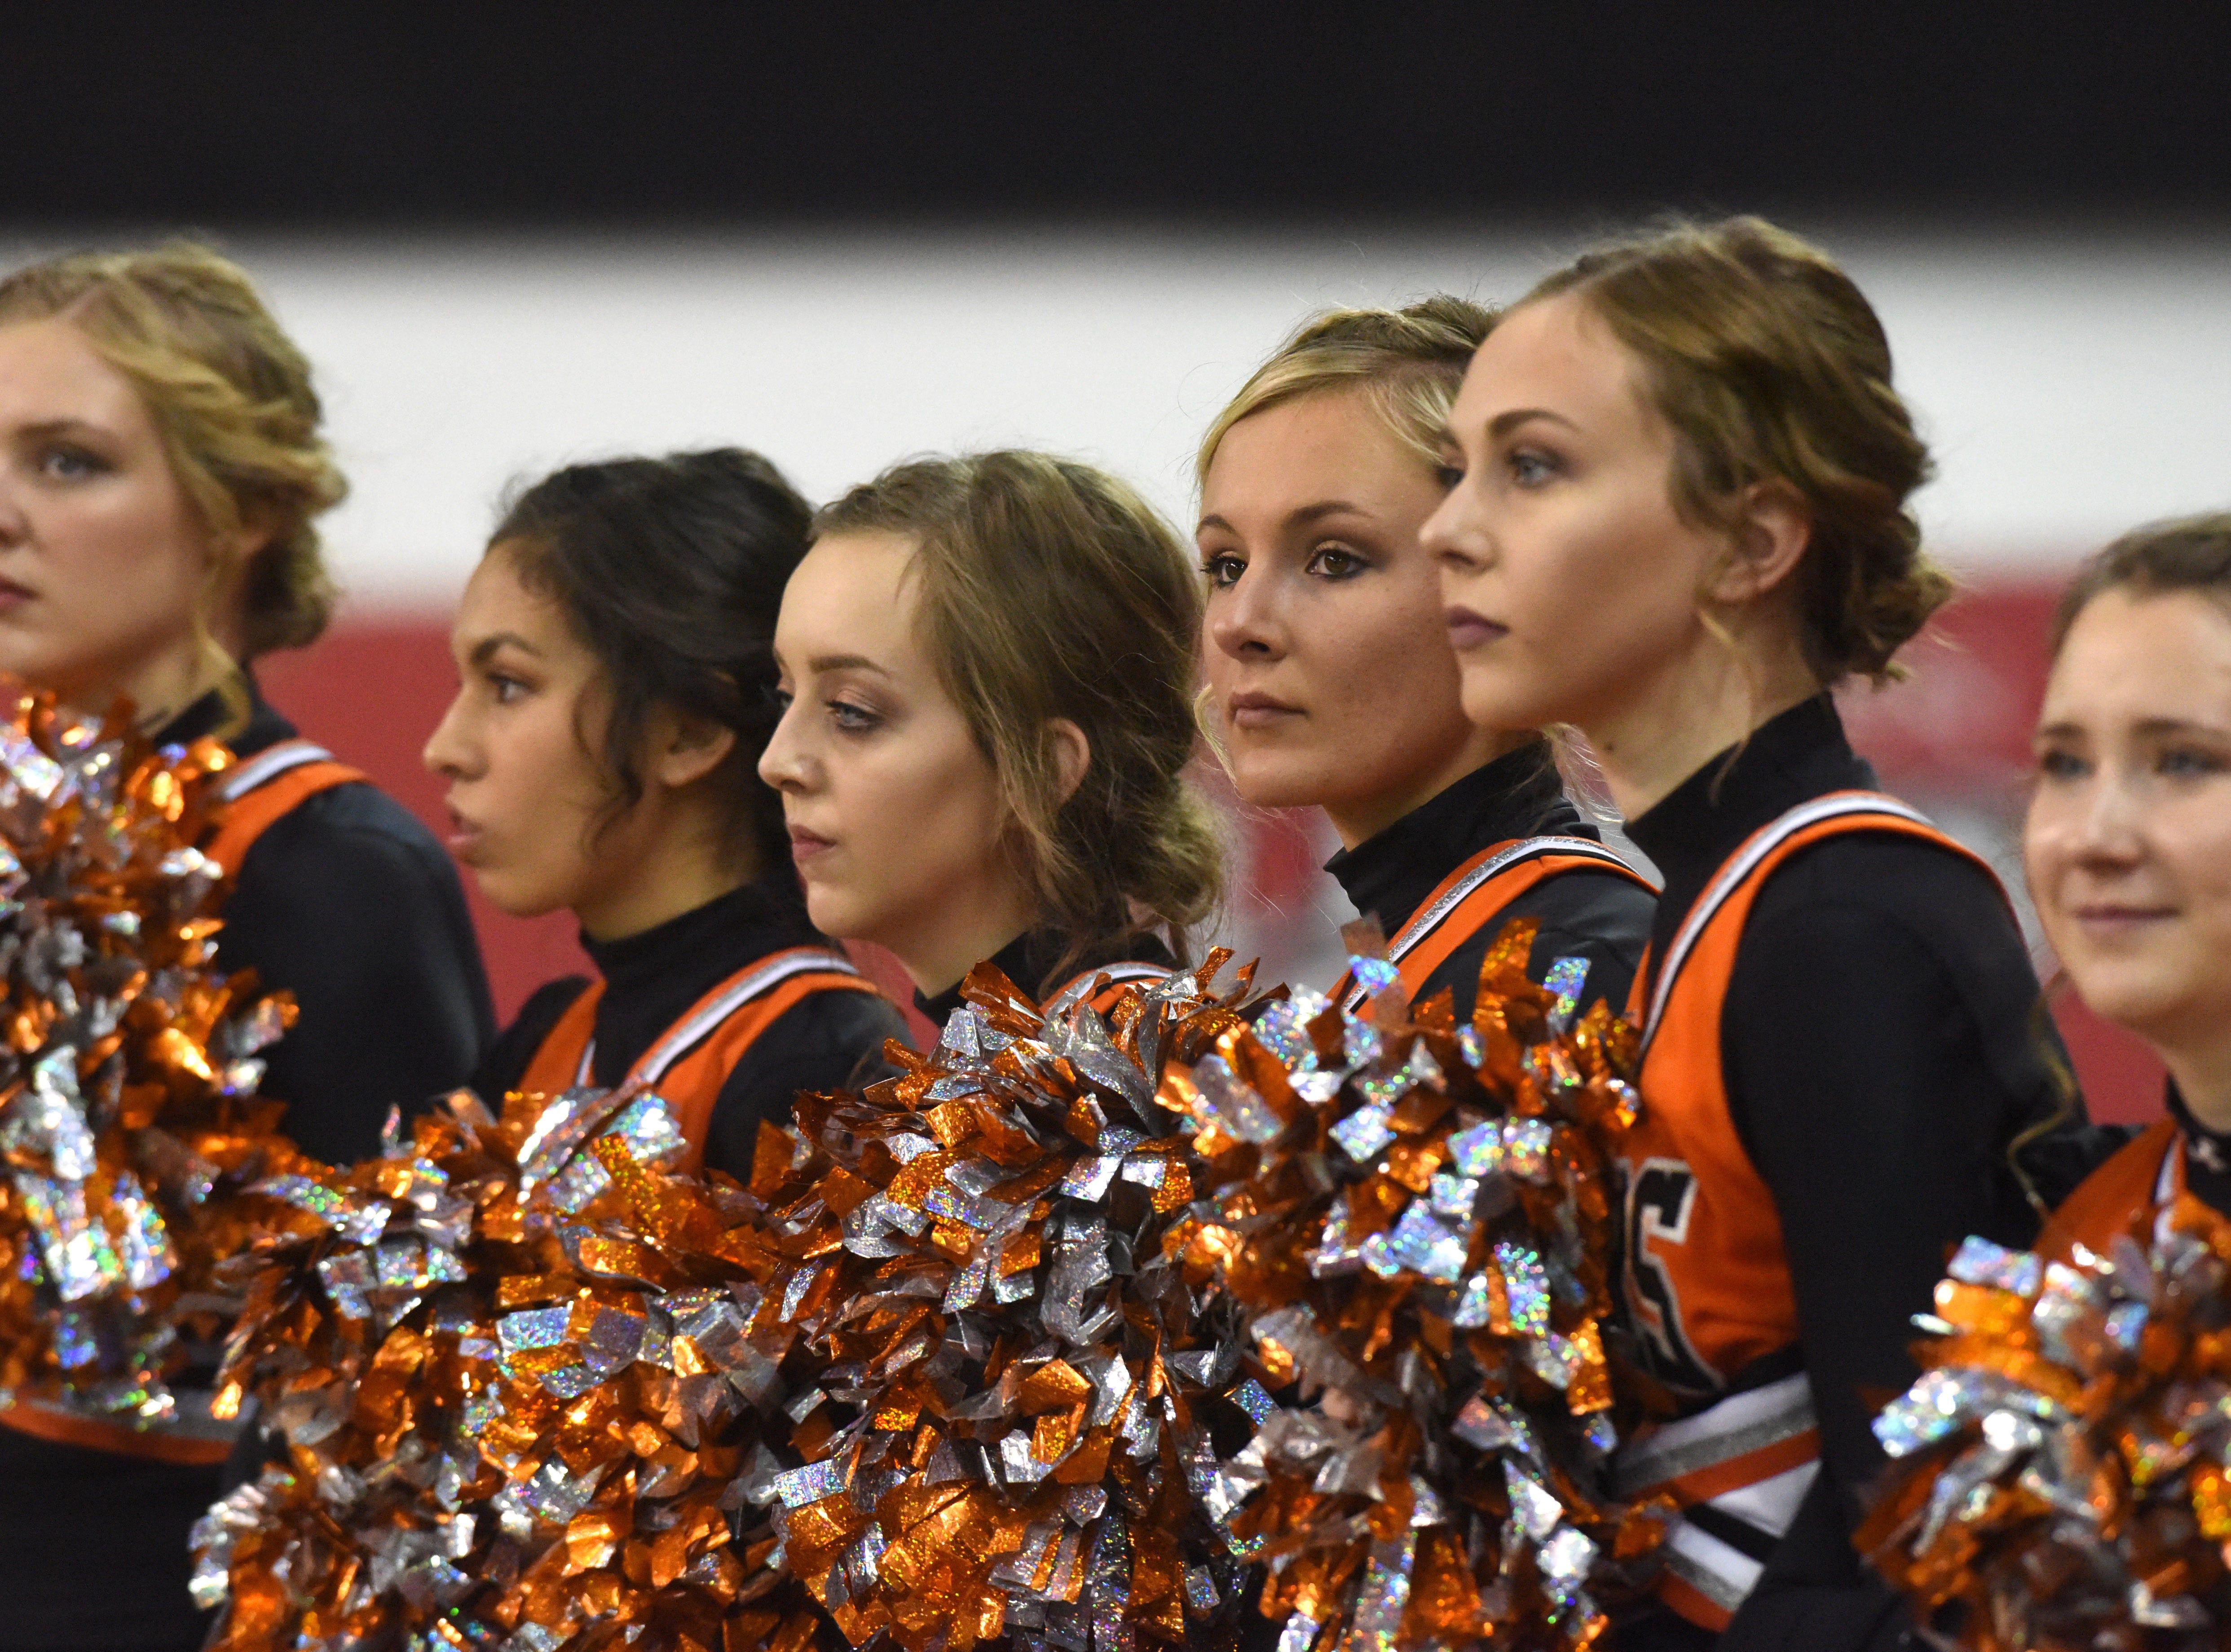 Canistota/Freeman cheerleaders watch the game against Howard, Thursday, Nov. 8, 2018 at the DakotaDome in Vermillion, S.D.